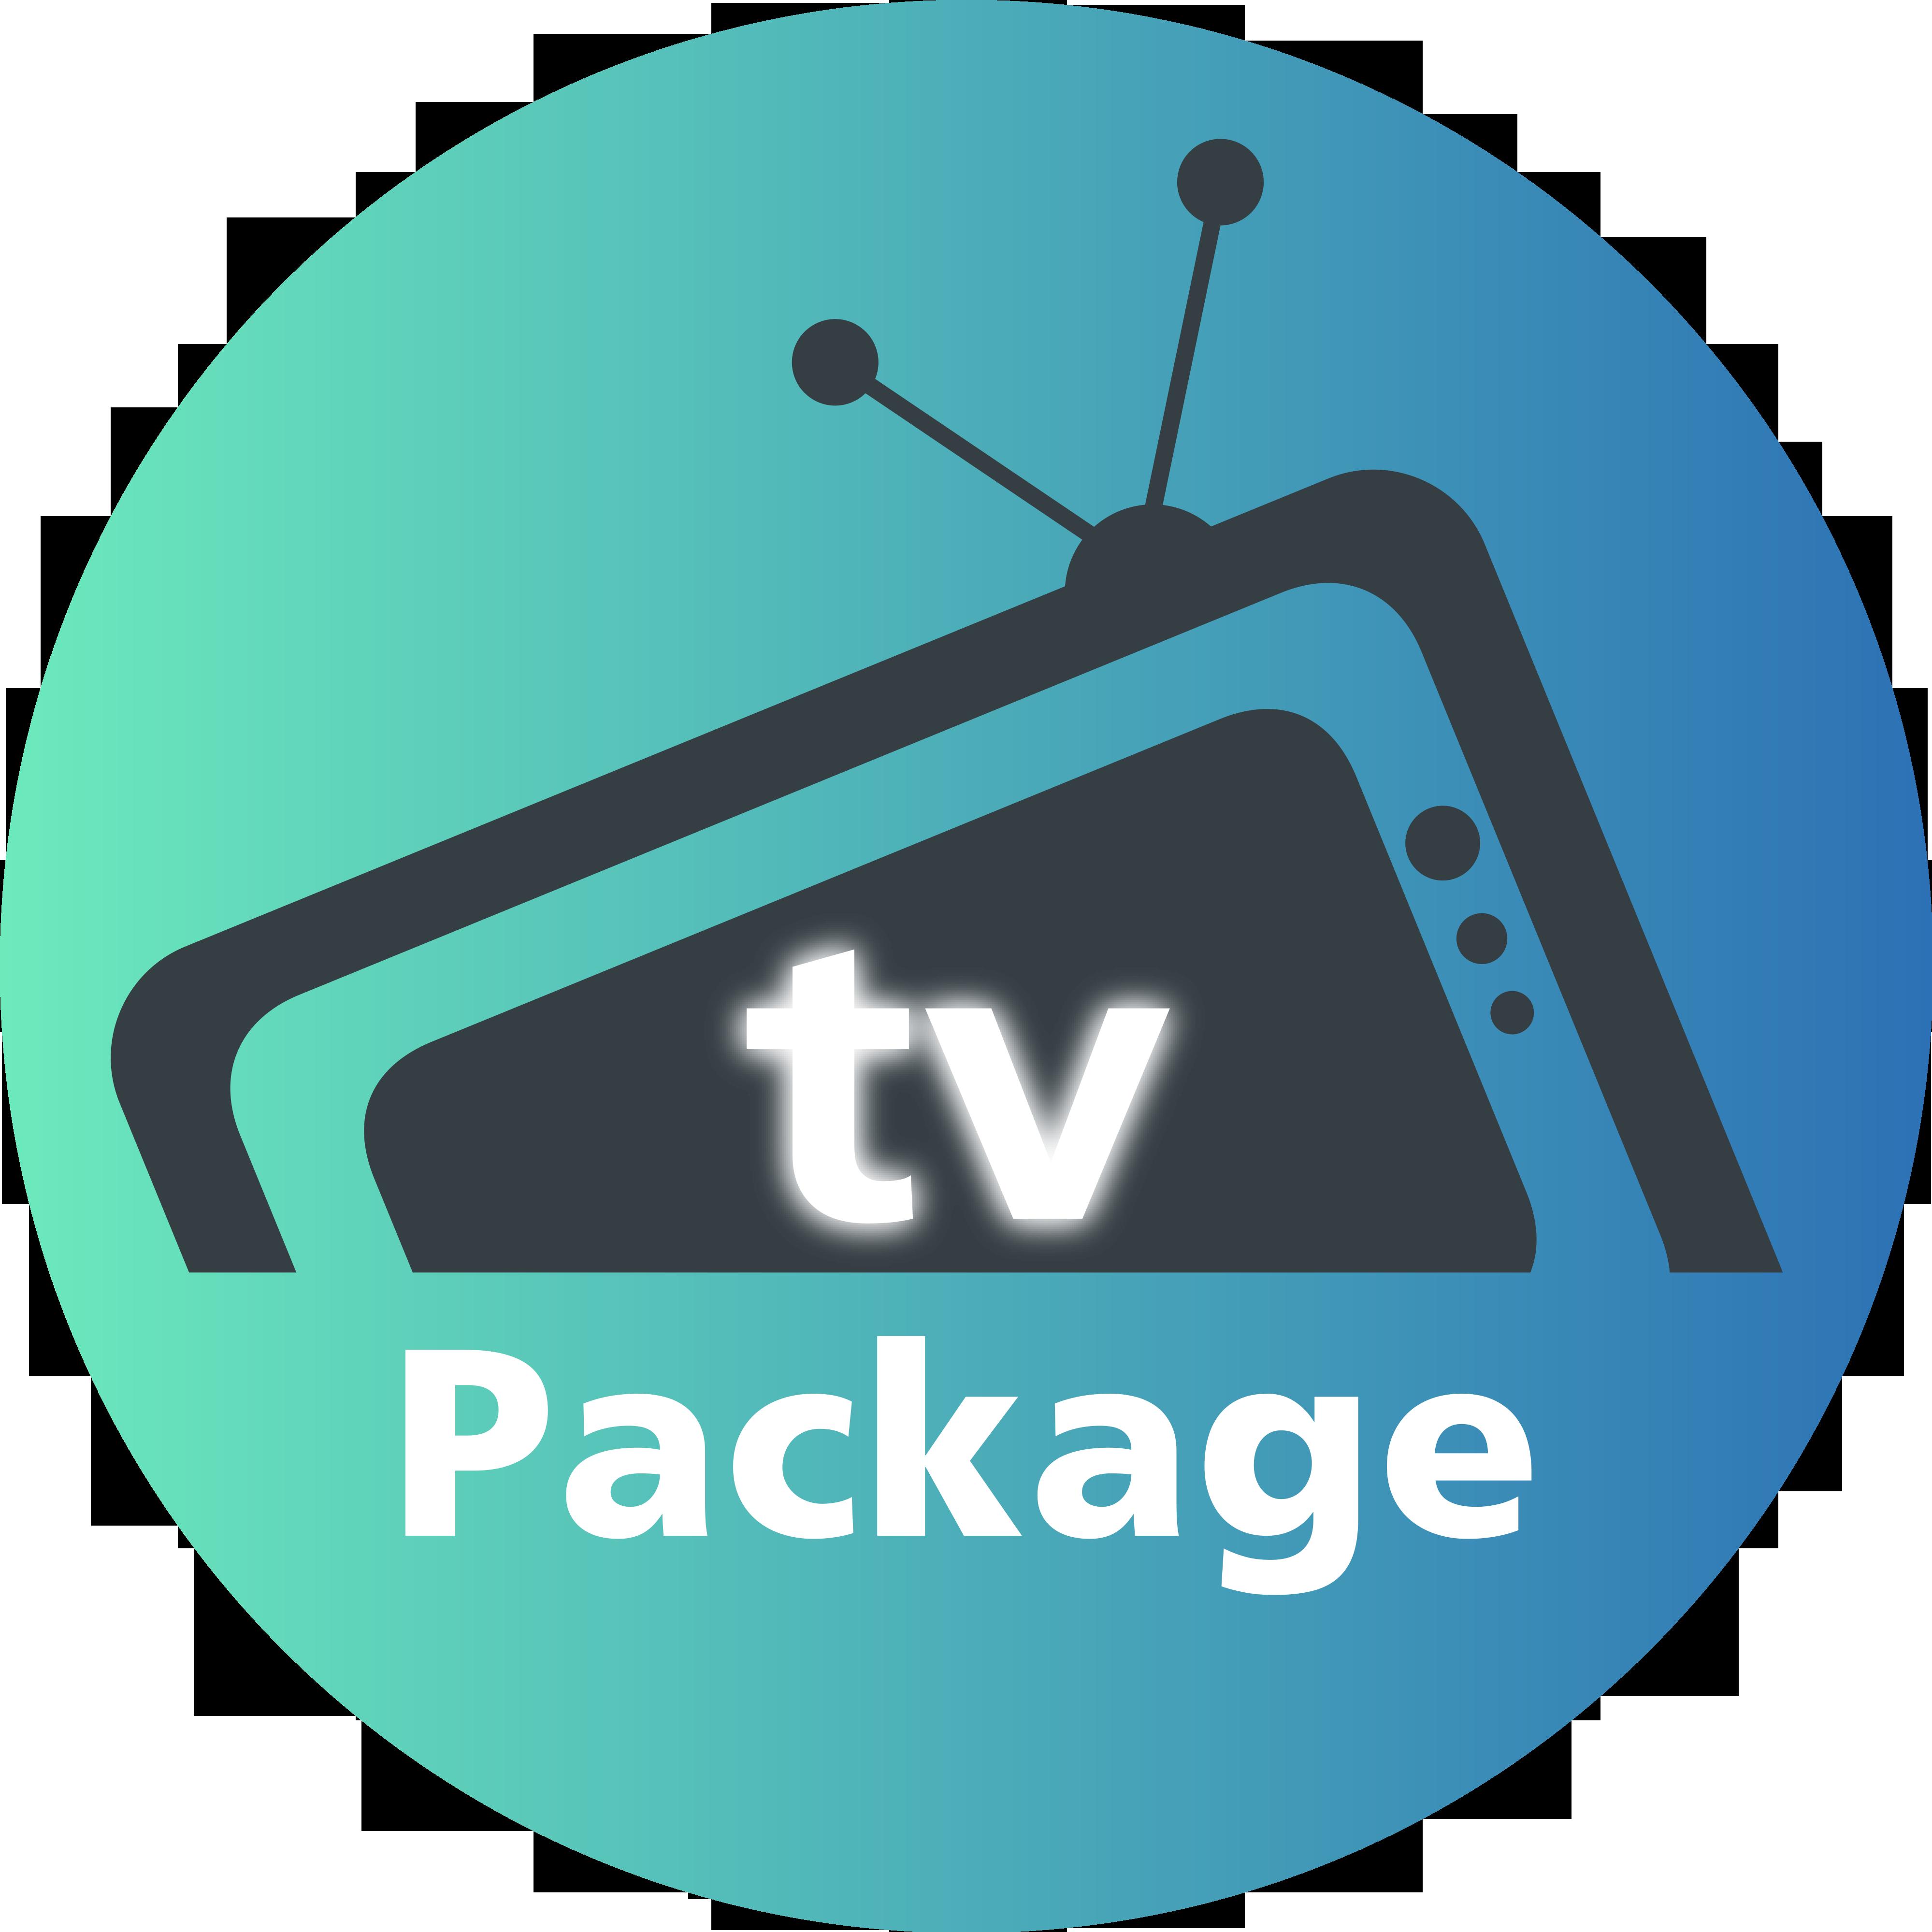 [TrueIDapp] Commerce: 2 TV Package